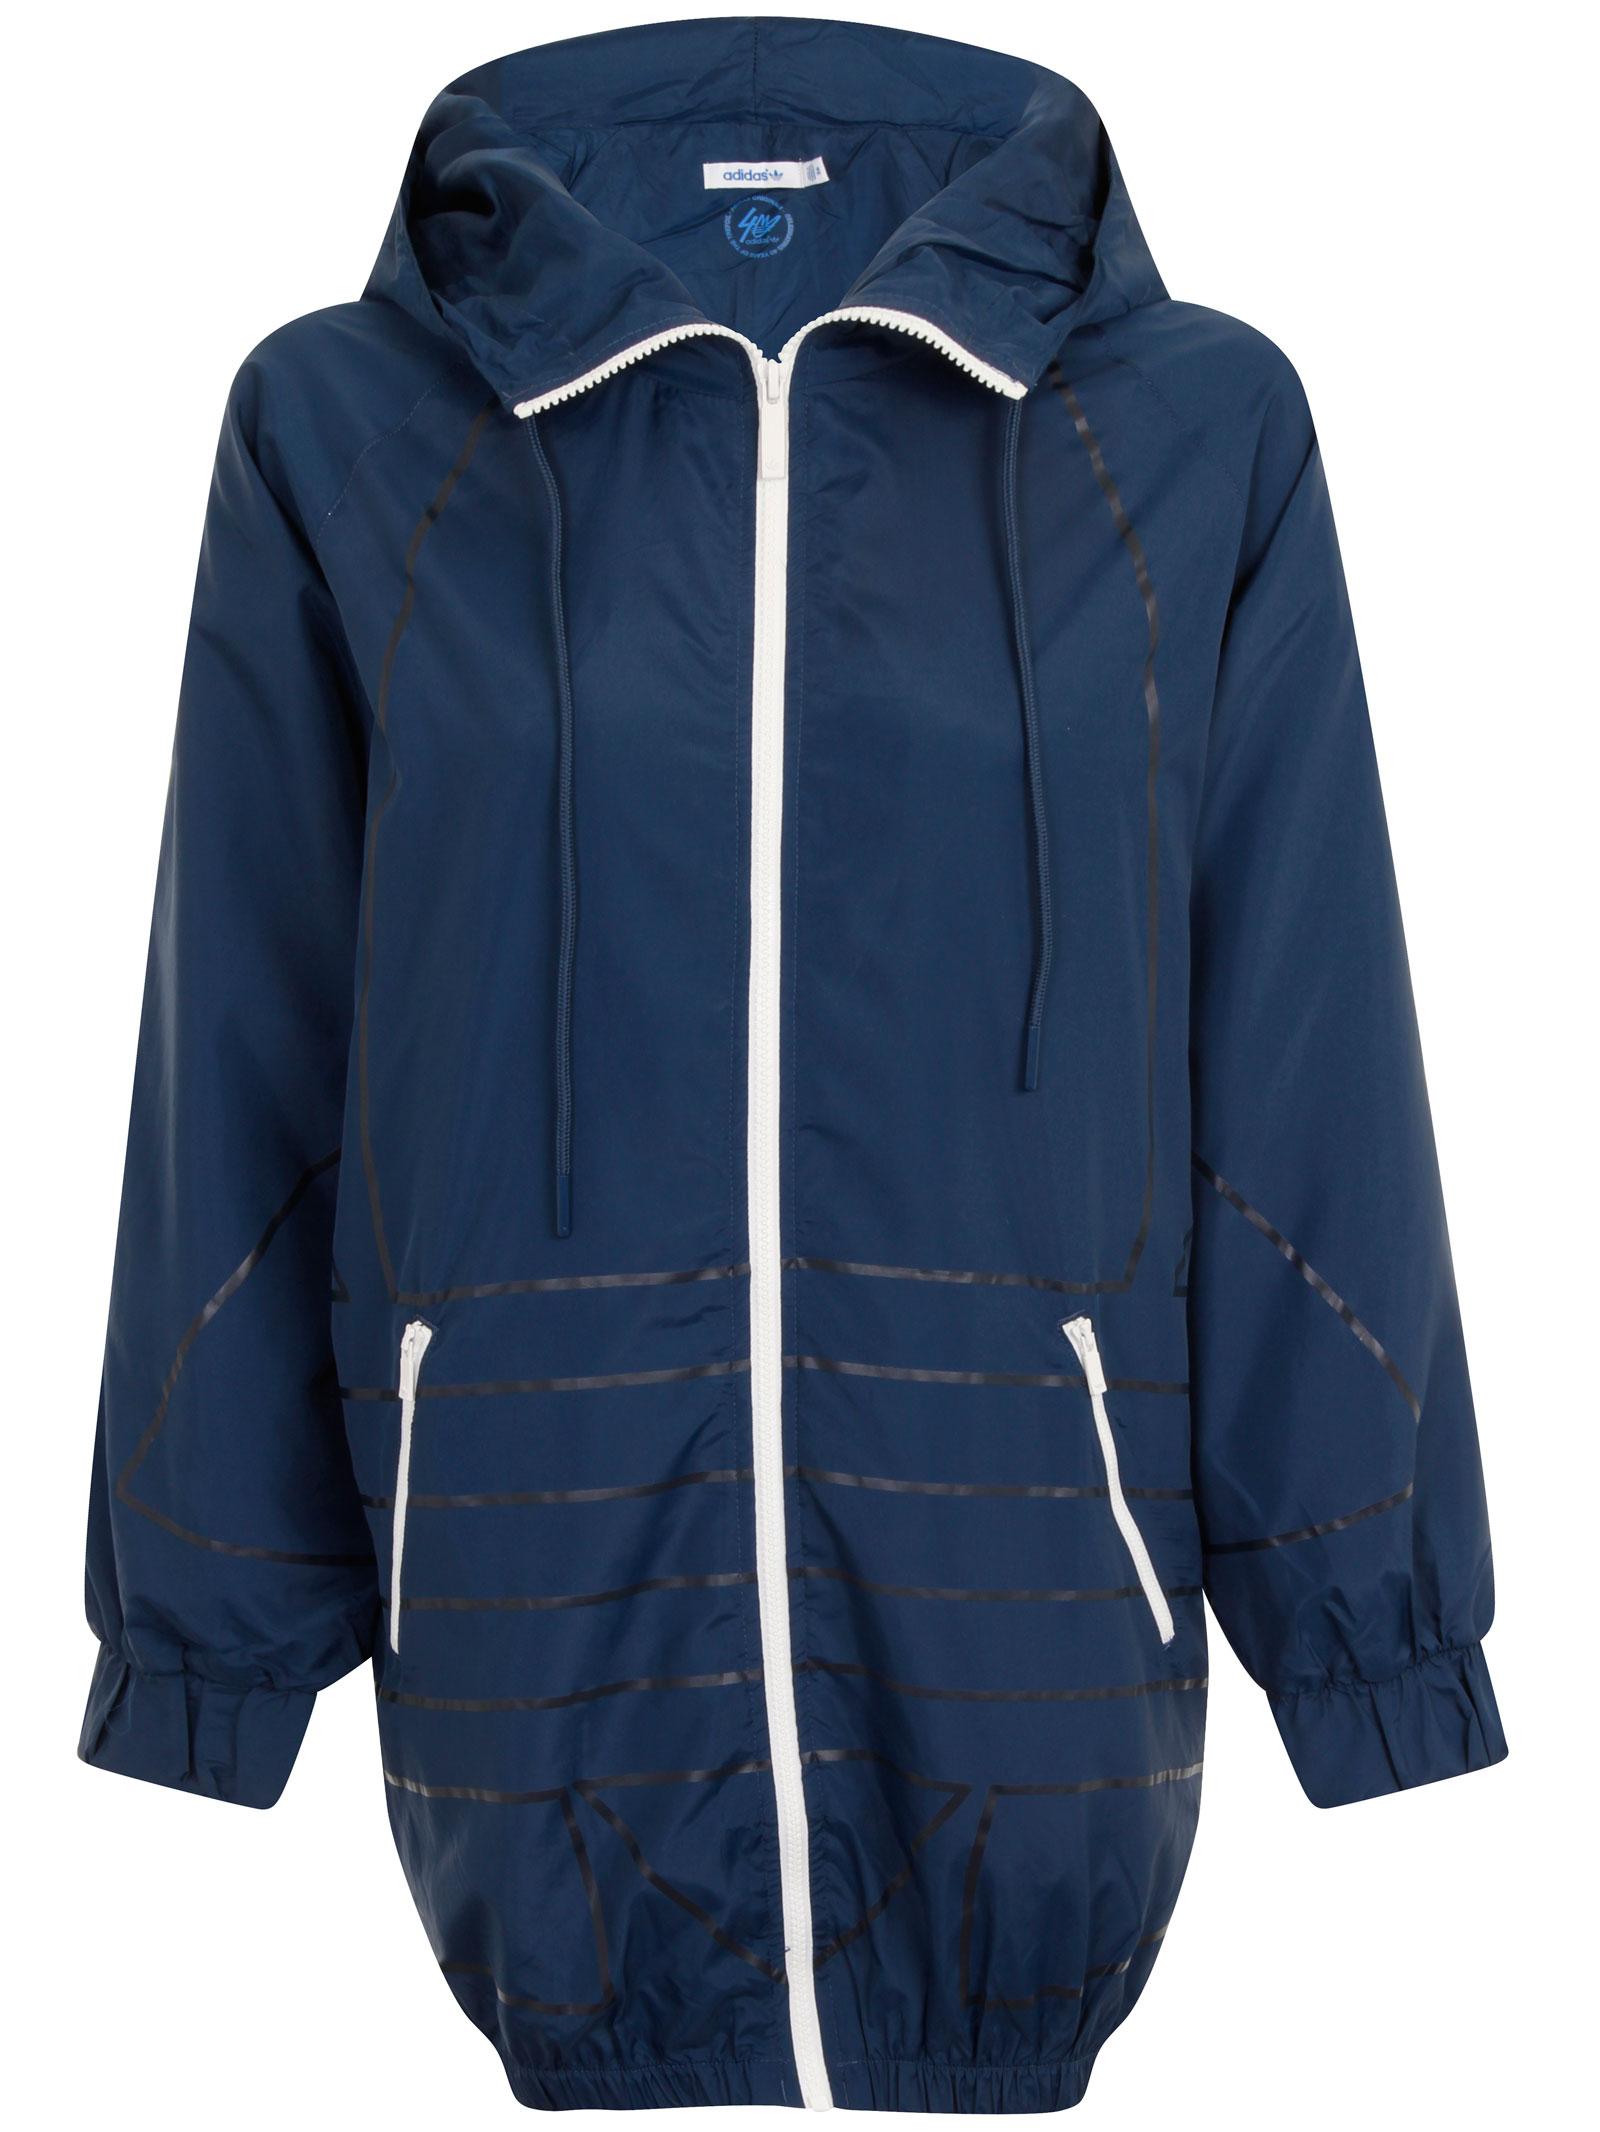 chaqueta adidas mujer capucha